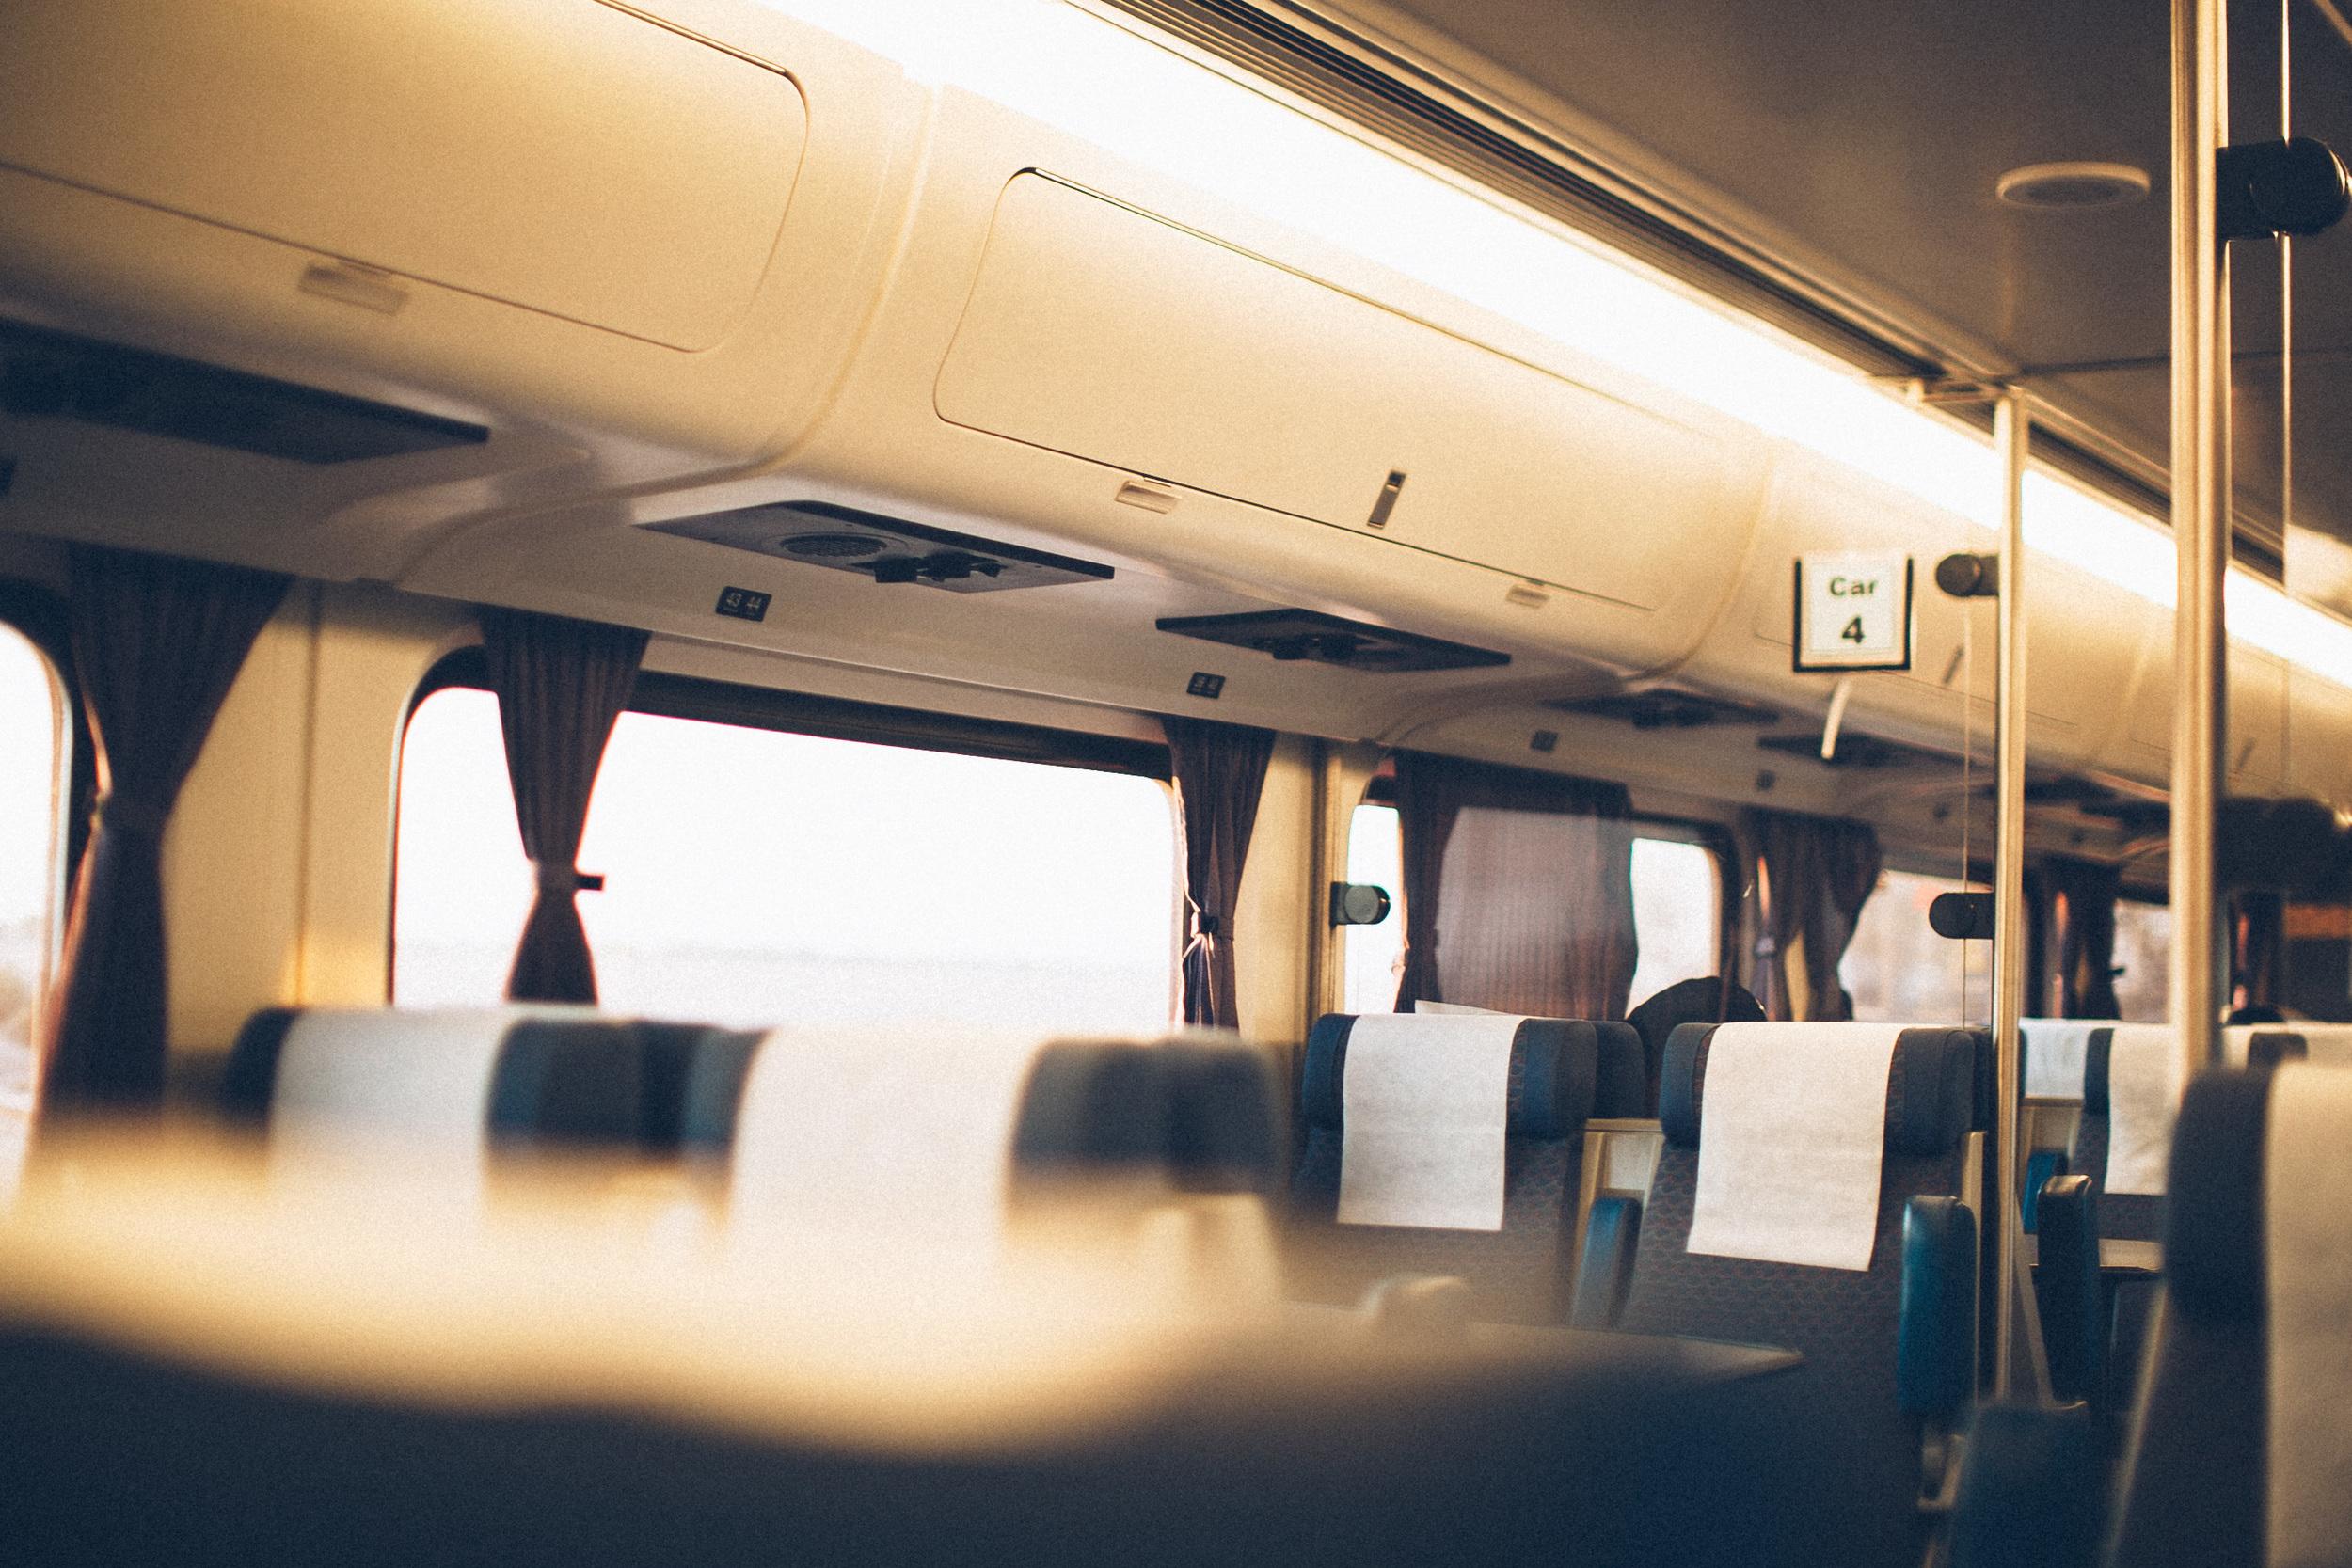 sanfrancisco-0940.jpg